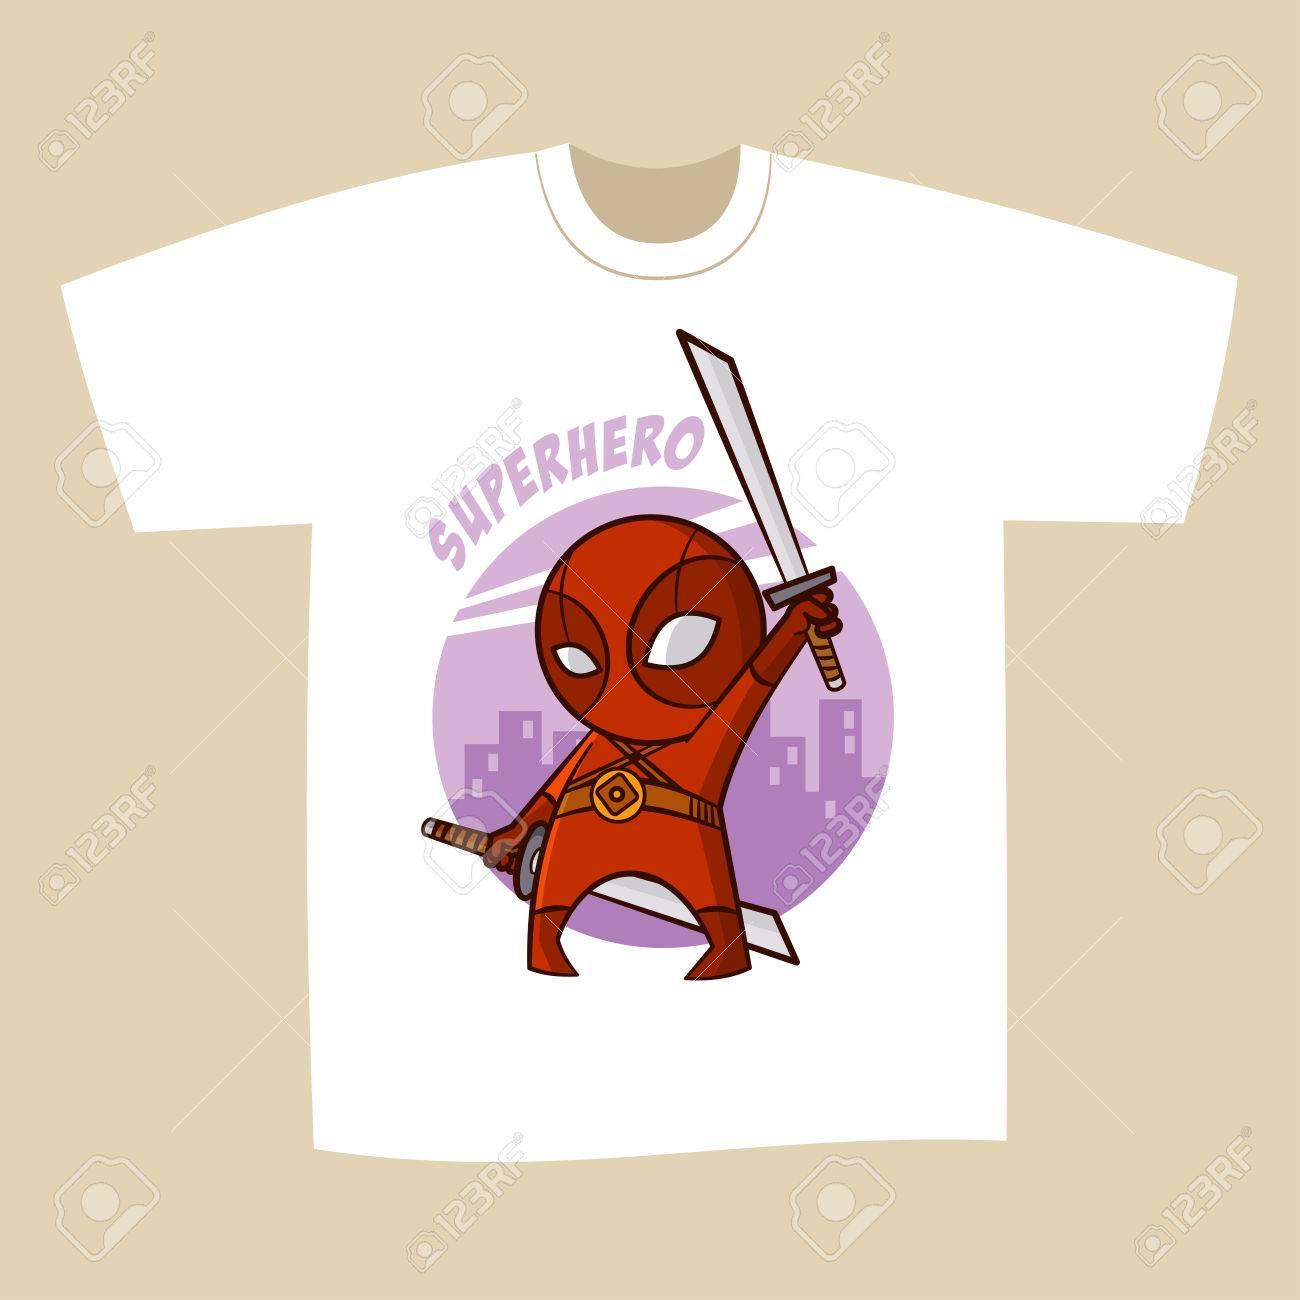 e0b27fc4 T-shirt White Print Design Superhero Ninja Vector Illustration Stock Vector  - 75843631